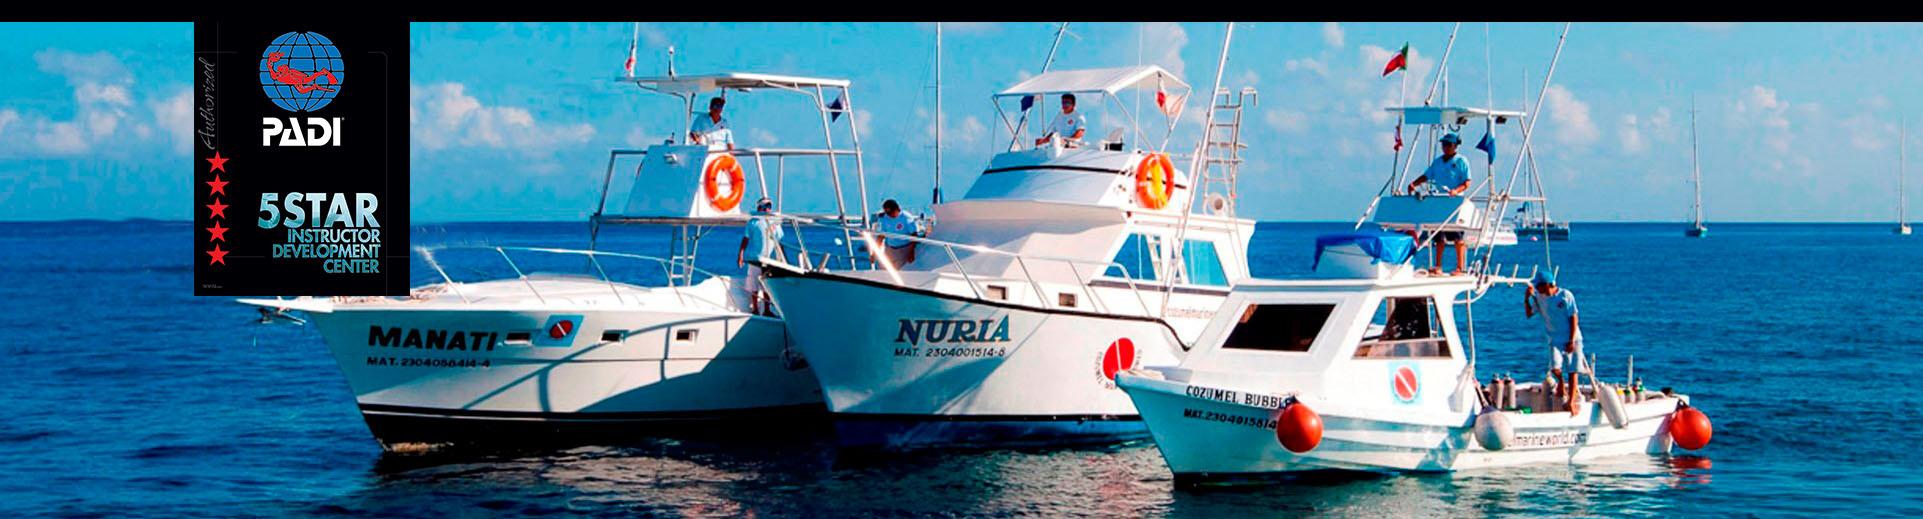 welcome to cozumel marine world